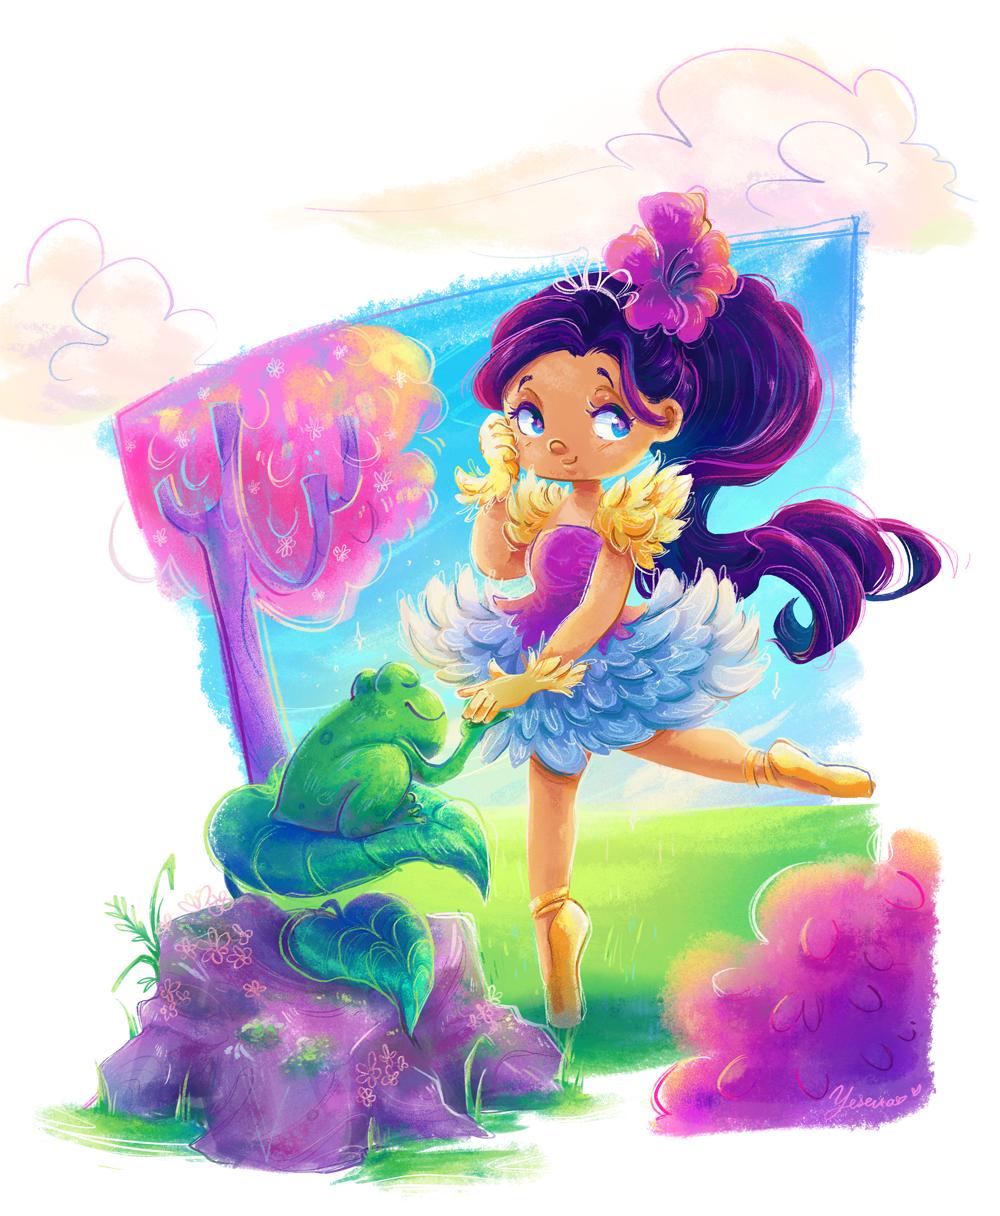 frog-princess.png